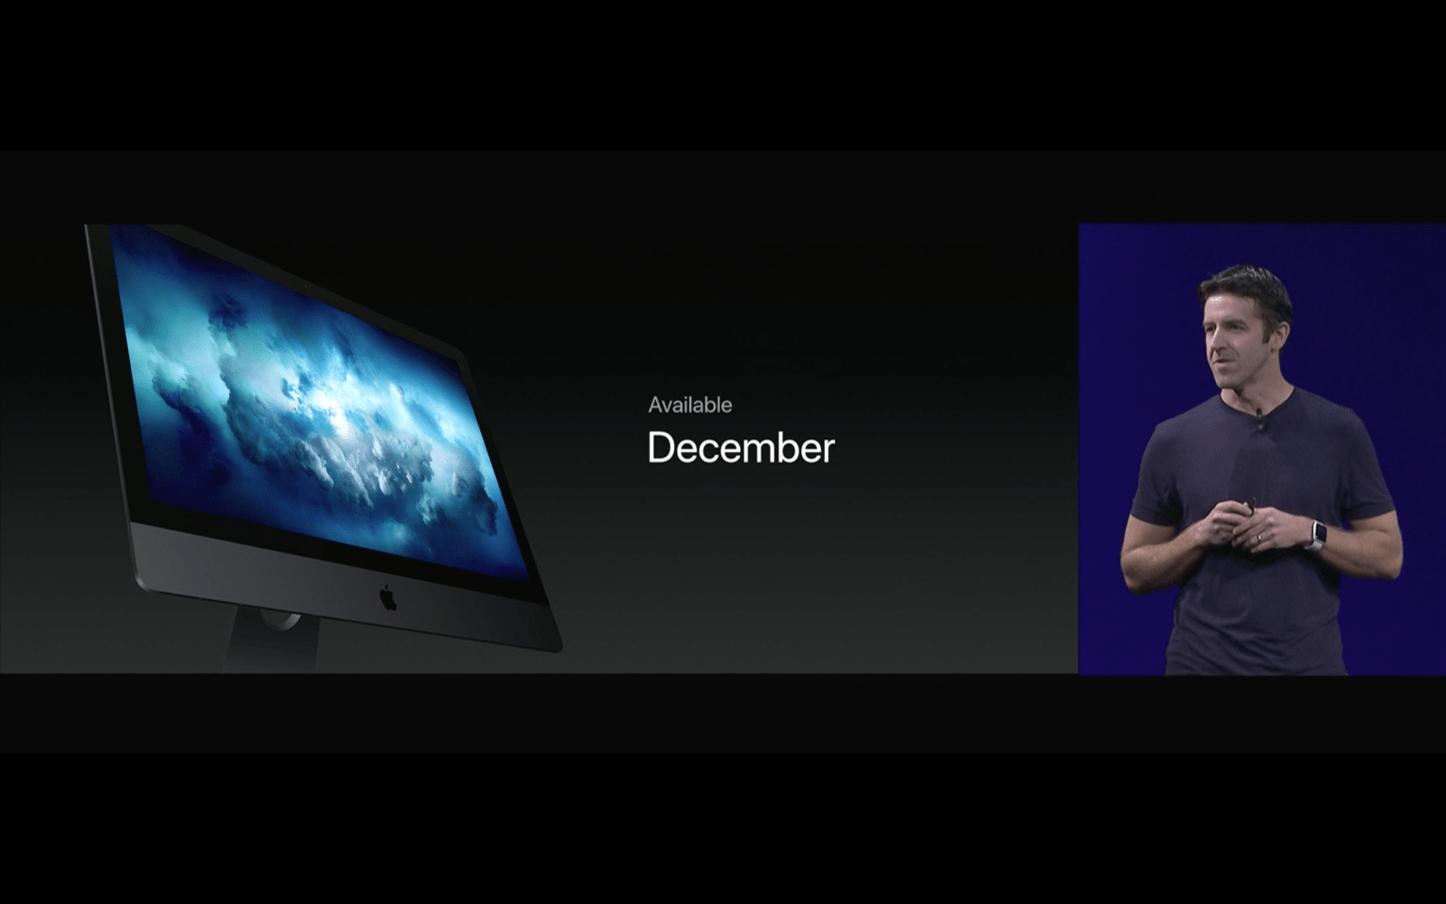 iMac-Pro-2017-WWDC17-28.png